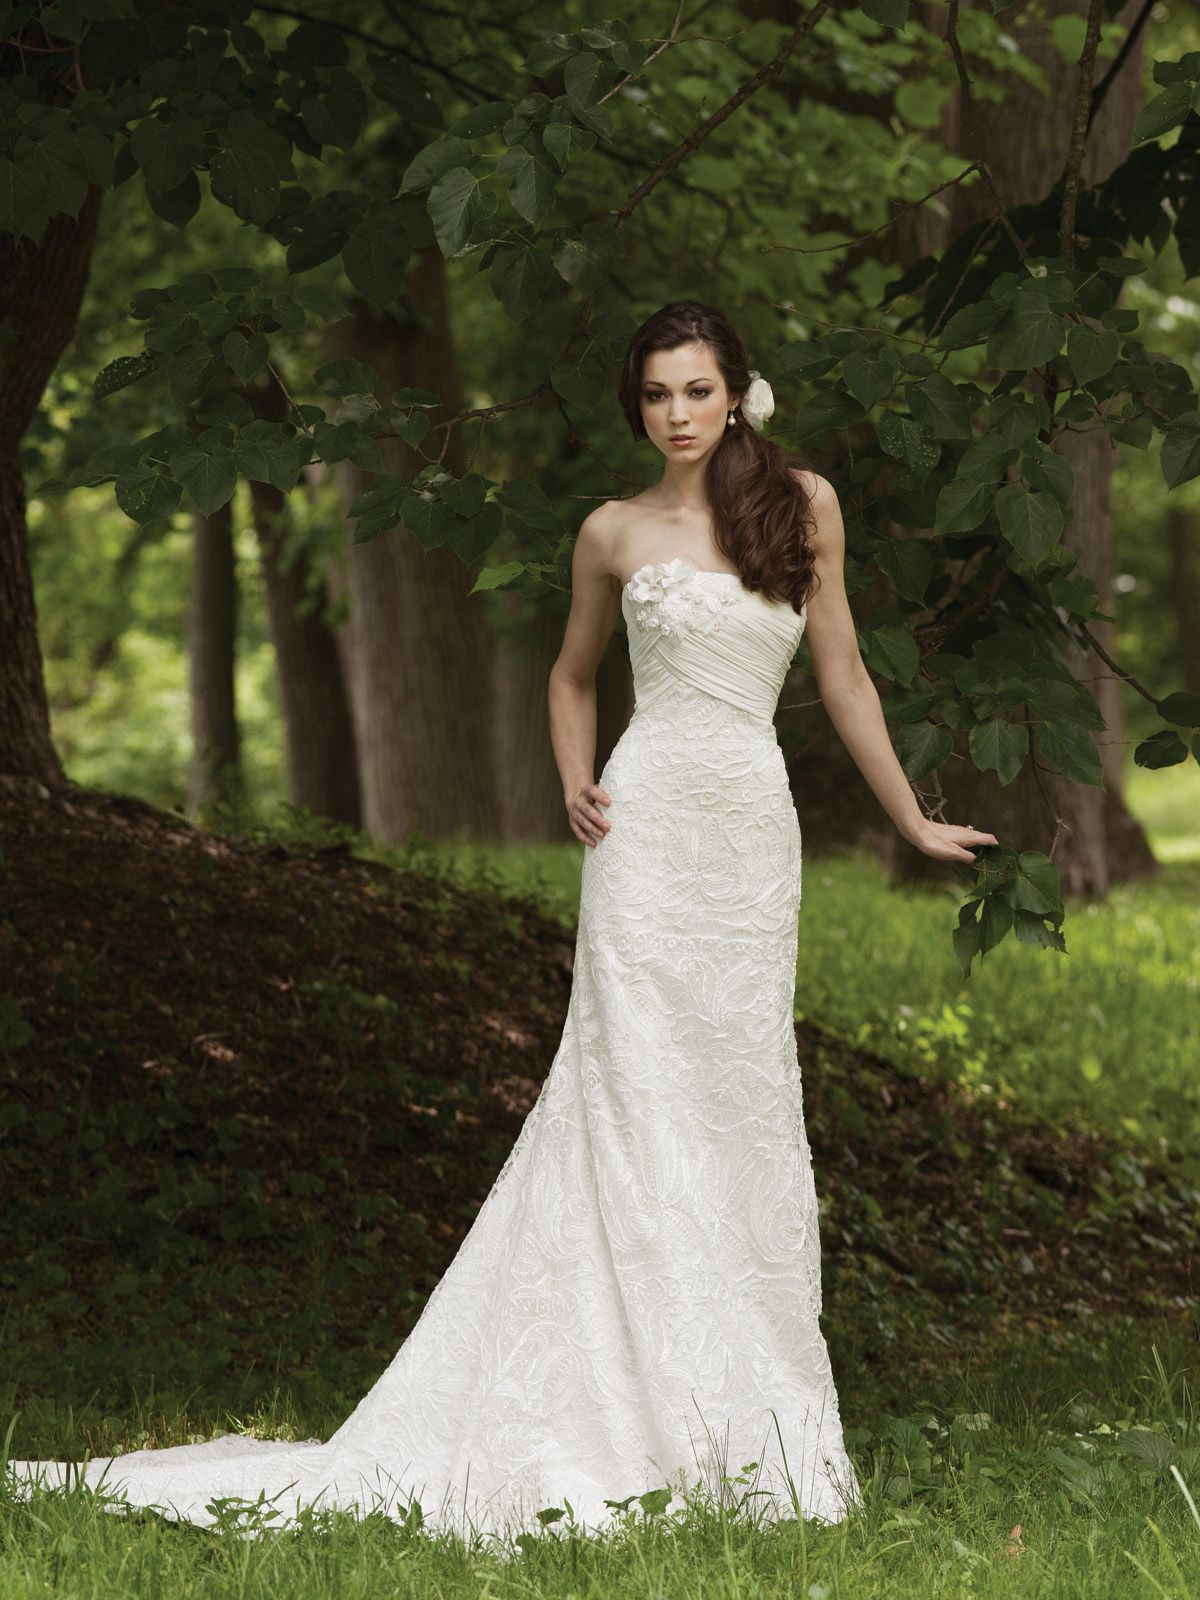 2017 Designer Wedding Dresses & Bridal Gowns | Kathy ireland ...